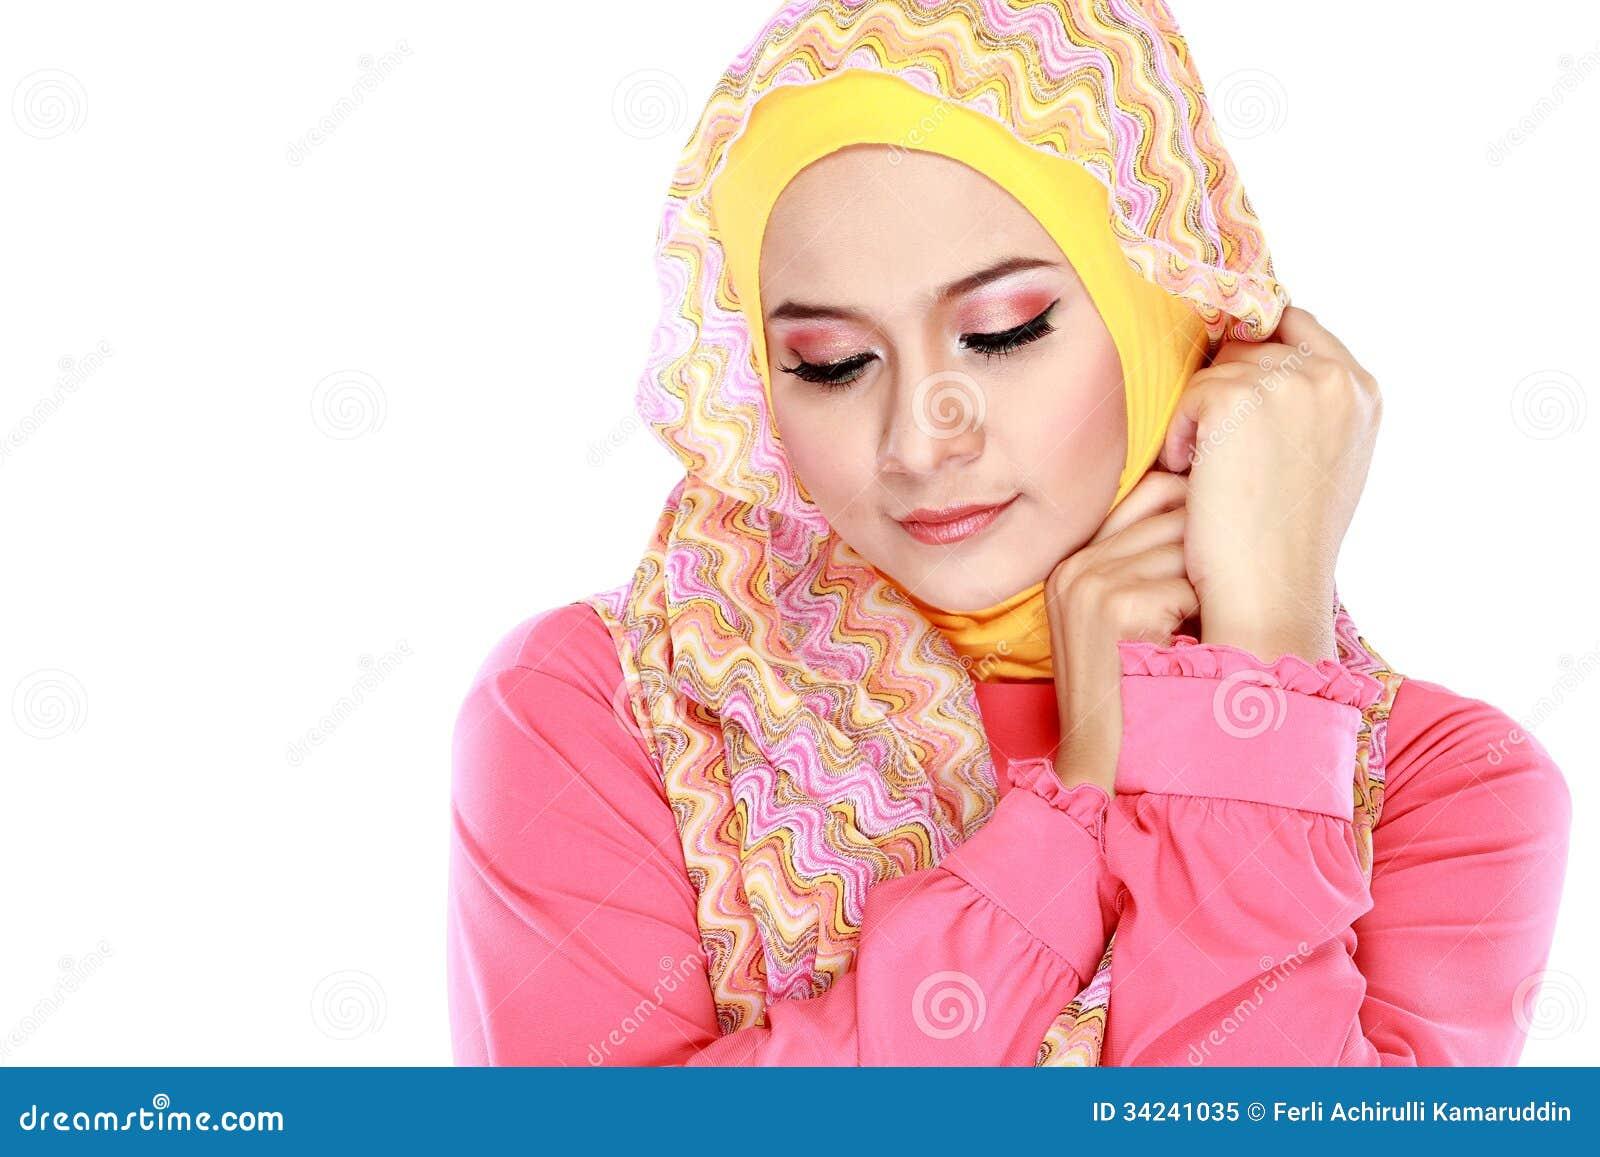 mode muslim These ladies were dominating muslim fashion long before  15 fashionable muslim women to follow on instagram  15 fashionable muslim women to follow.